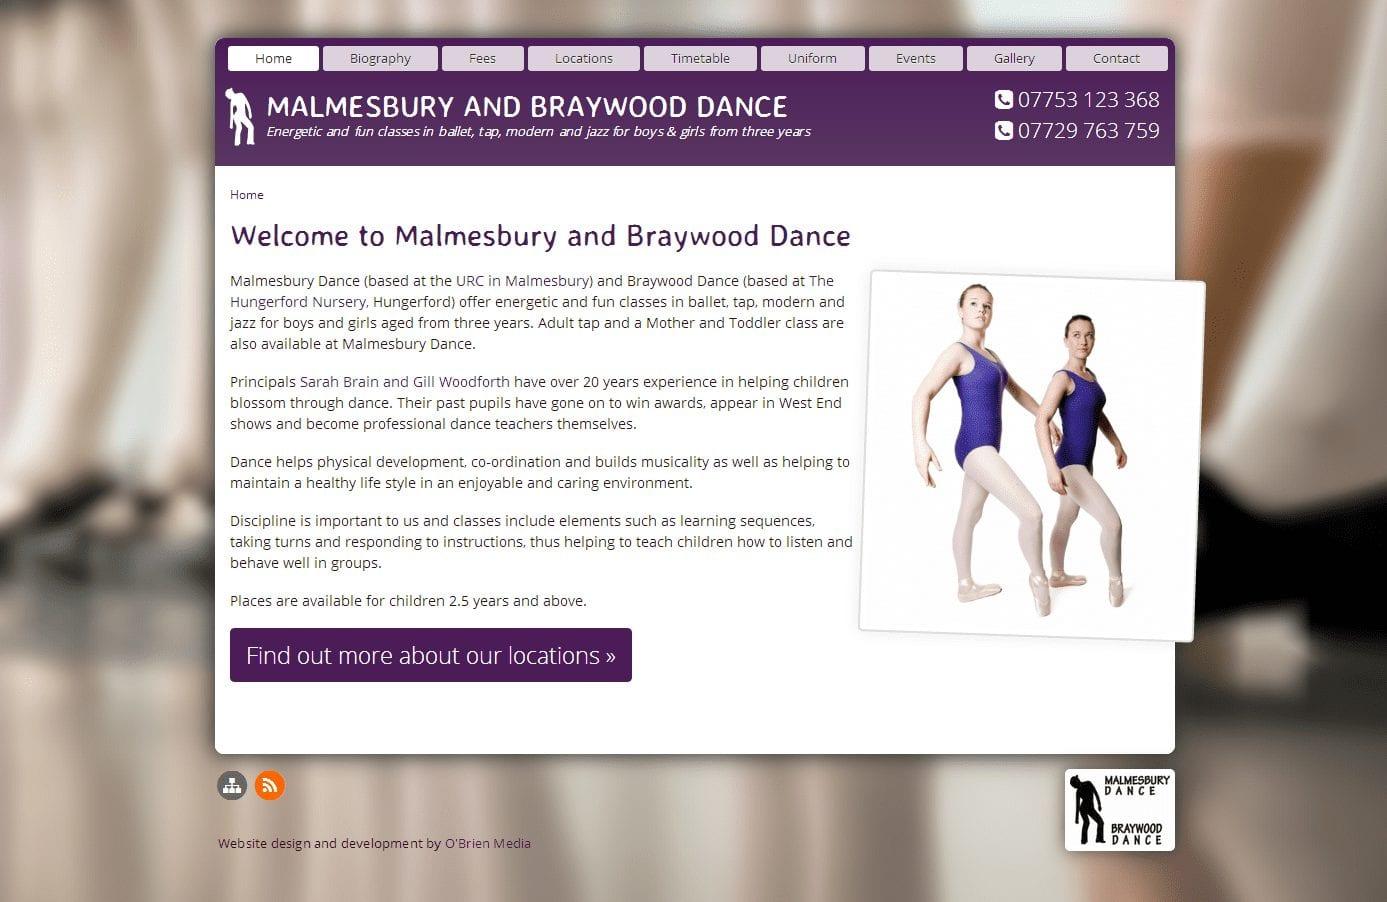 new-website-for-malmesbury-braywood-dance.png